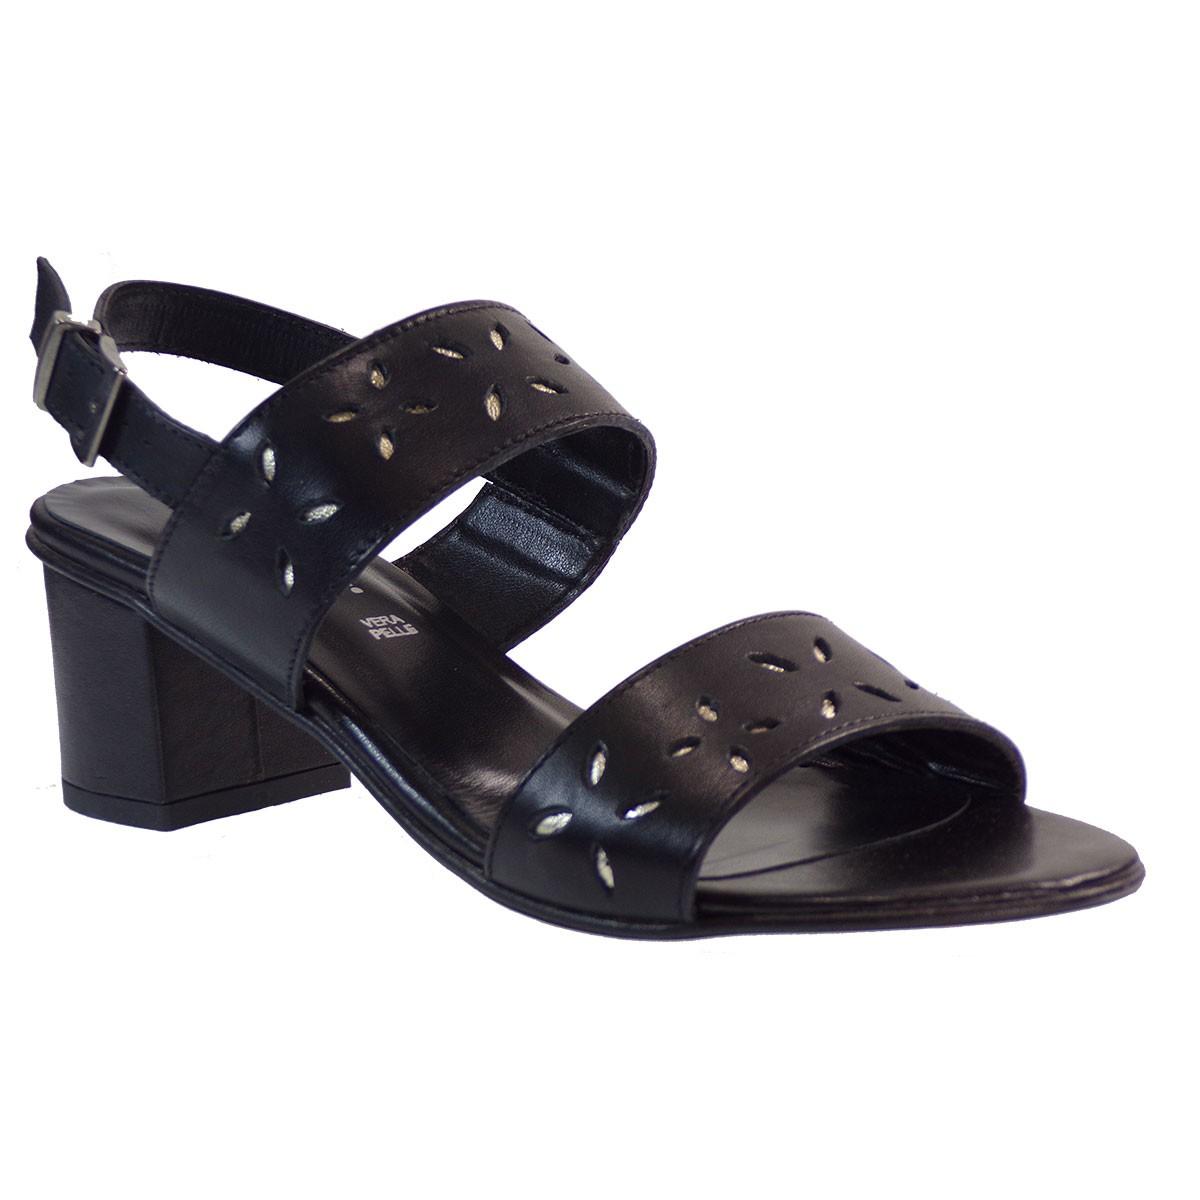 Cornelius Shoes Γυναικεία Πέδιλα 31-174 Μαύρο